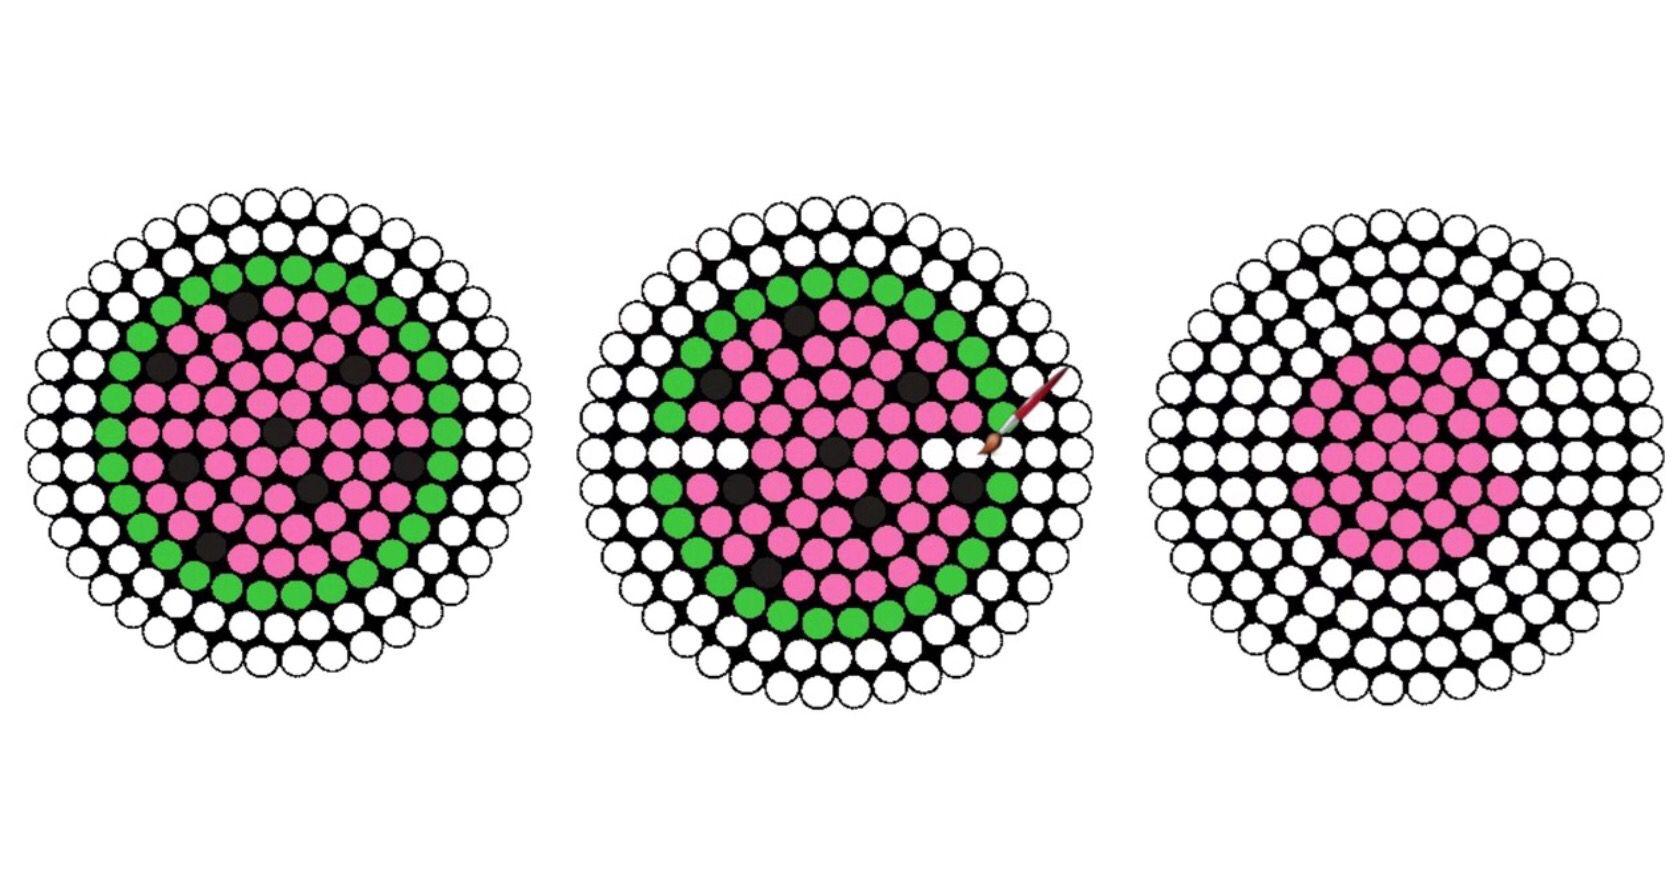 Watermelon Earbud Holder Perler Beads Pattern Diy Perler Beads